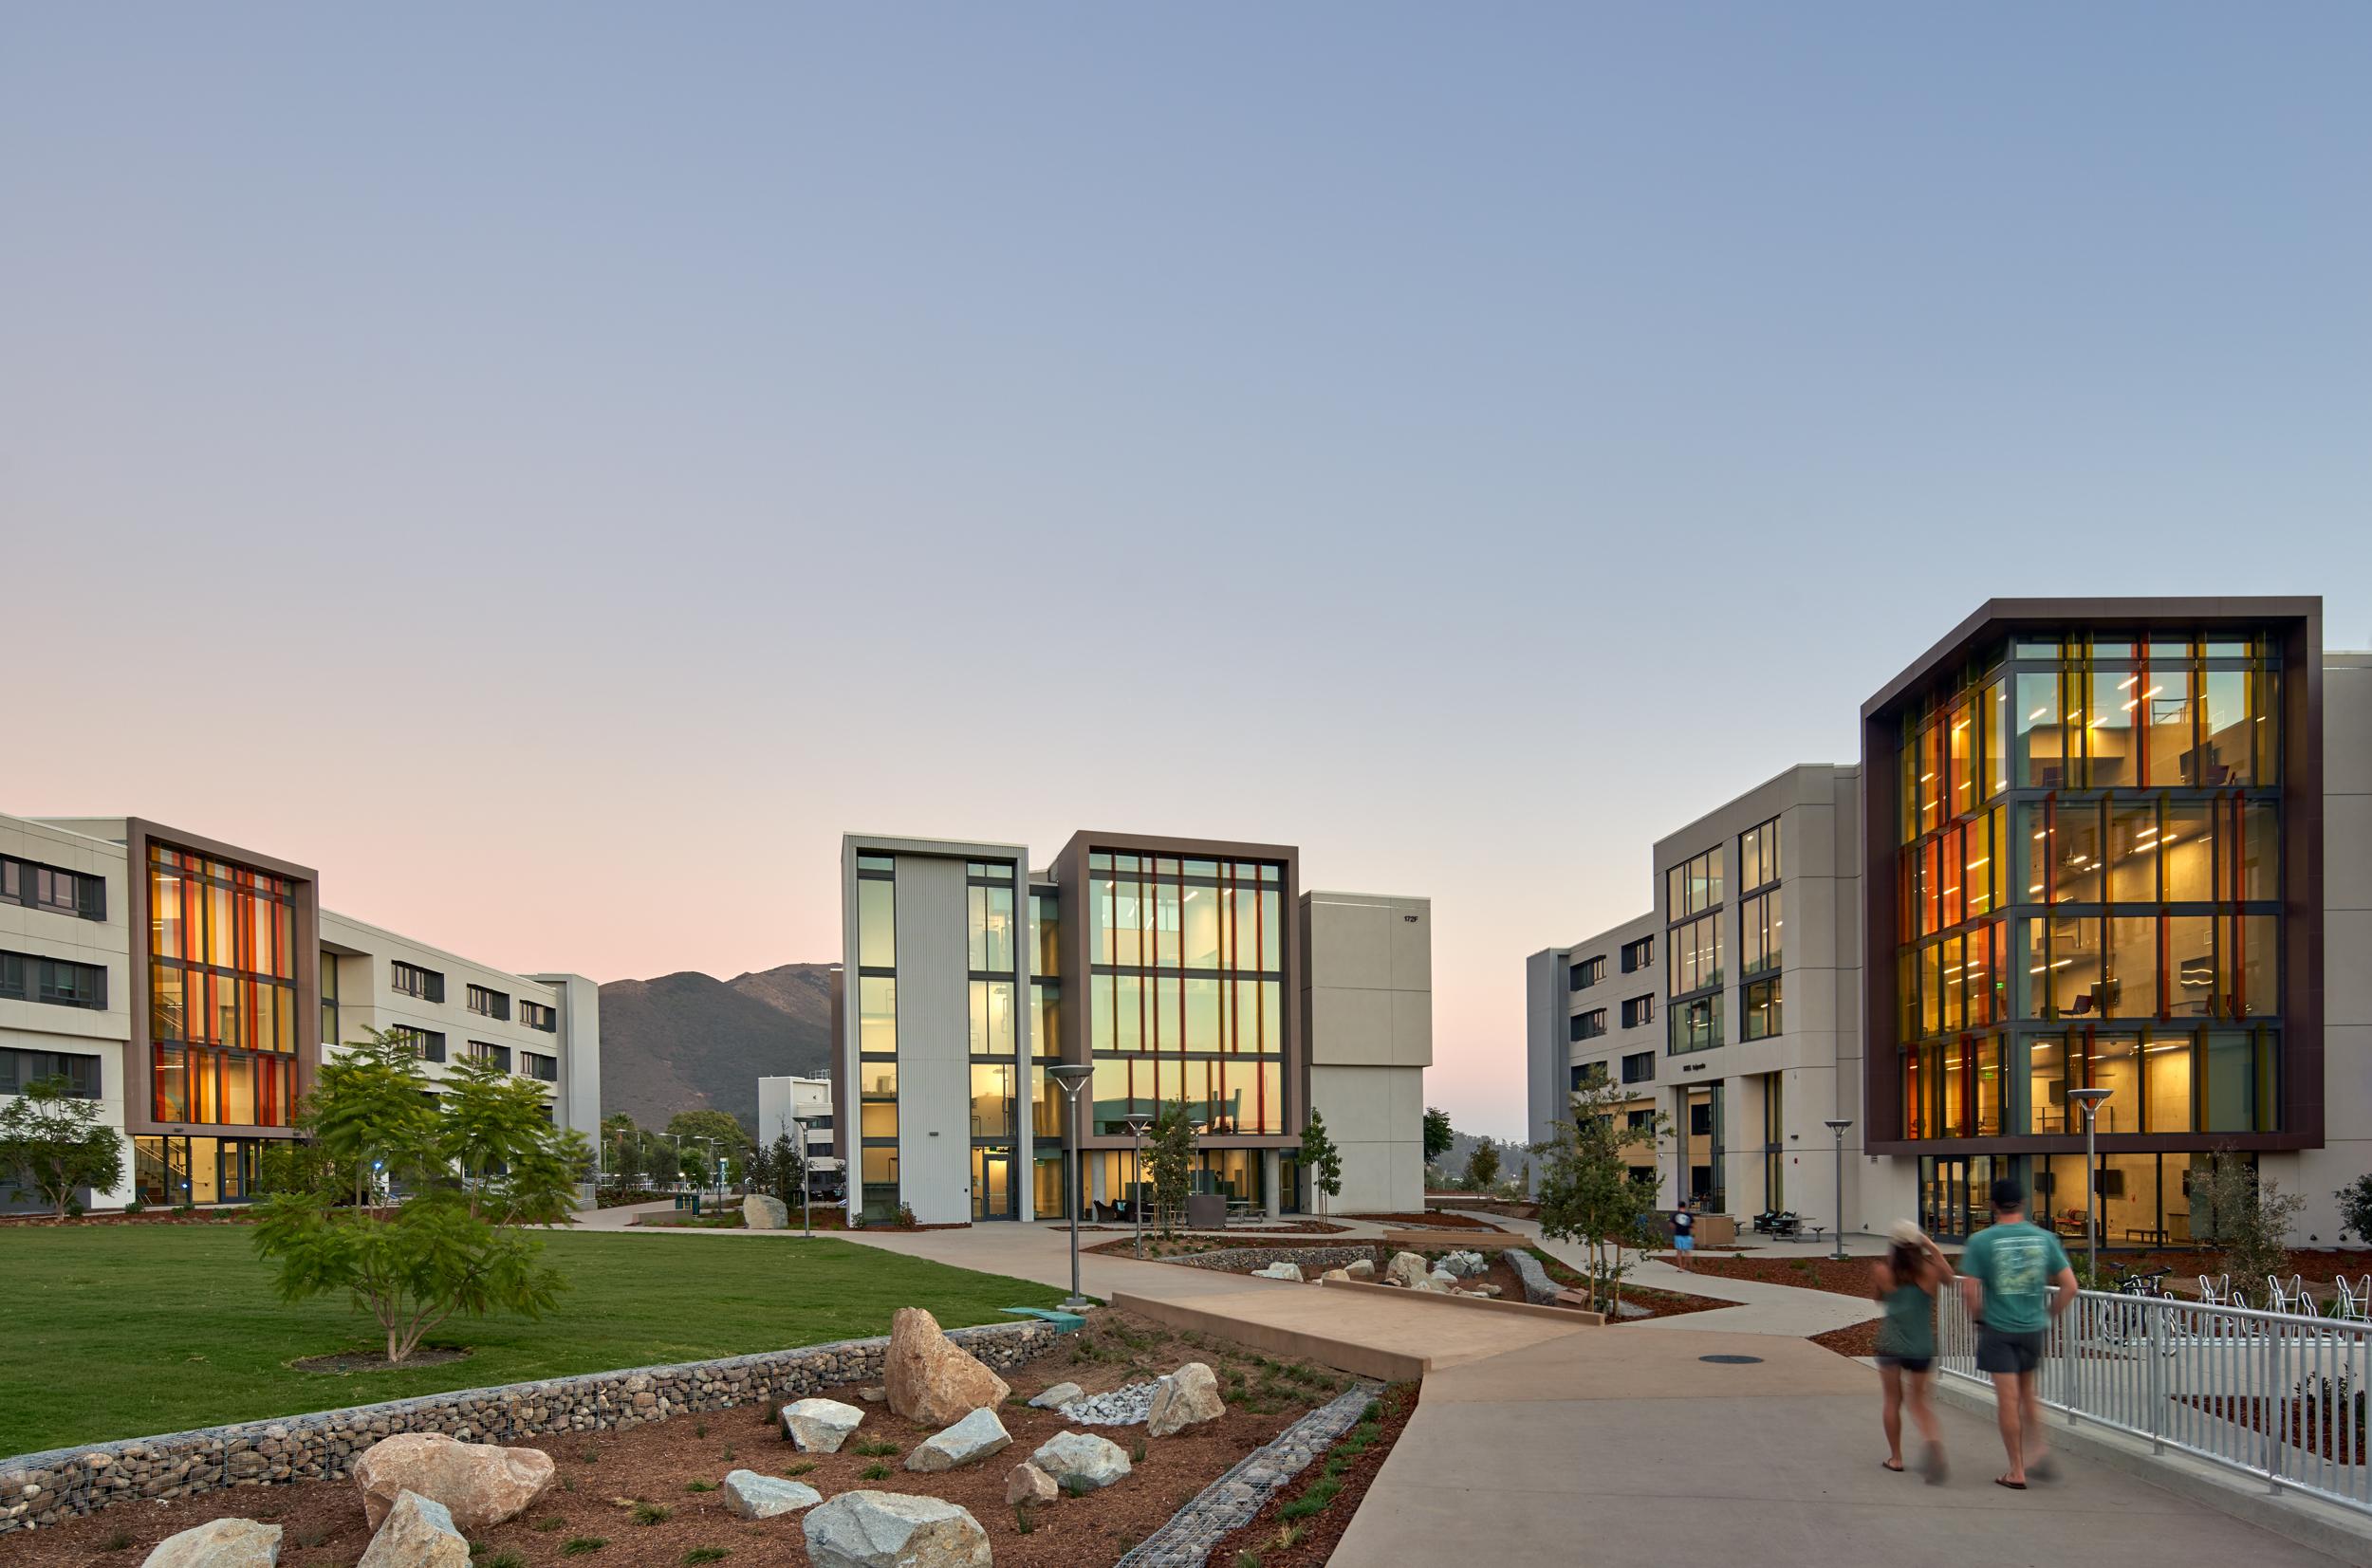 View of the Cal Poly yakʔityutyu Housing, San Luis Obispo, CA (Photo by Bruce Damonte)